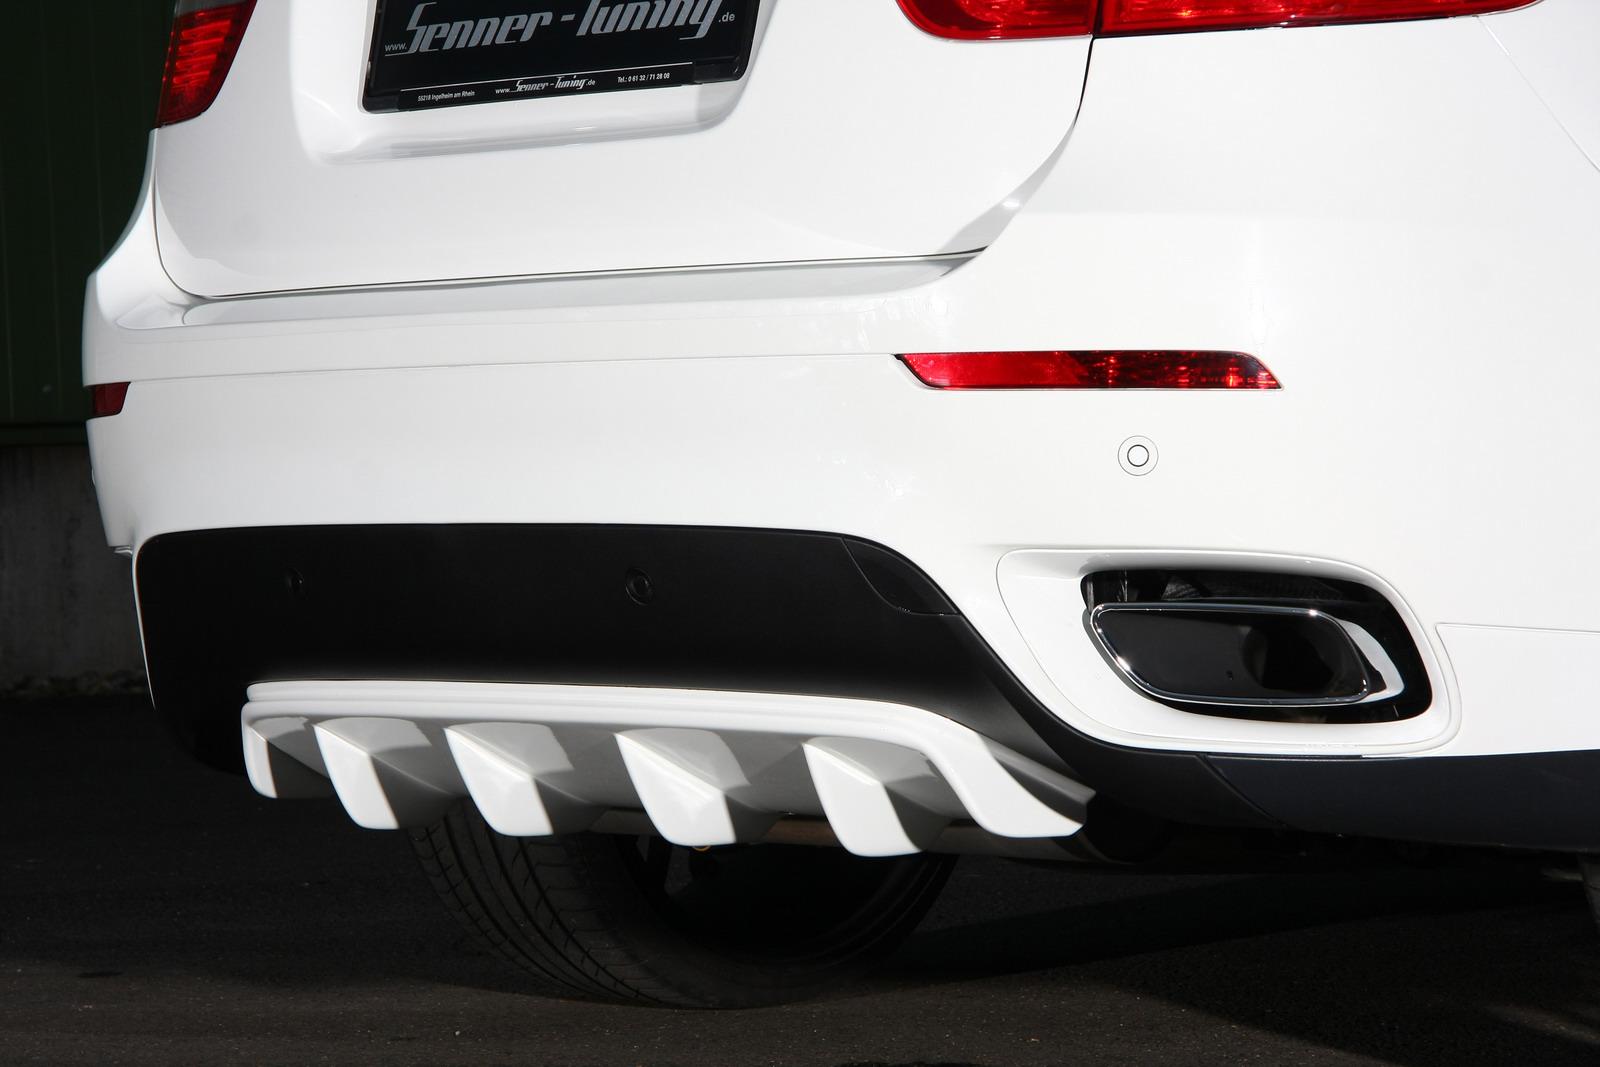 Naftové BMW X6 od Senner Tuning 5